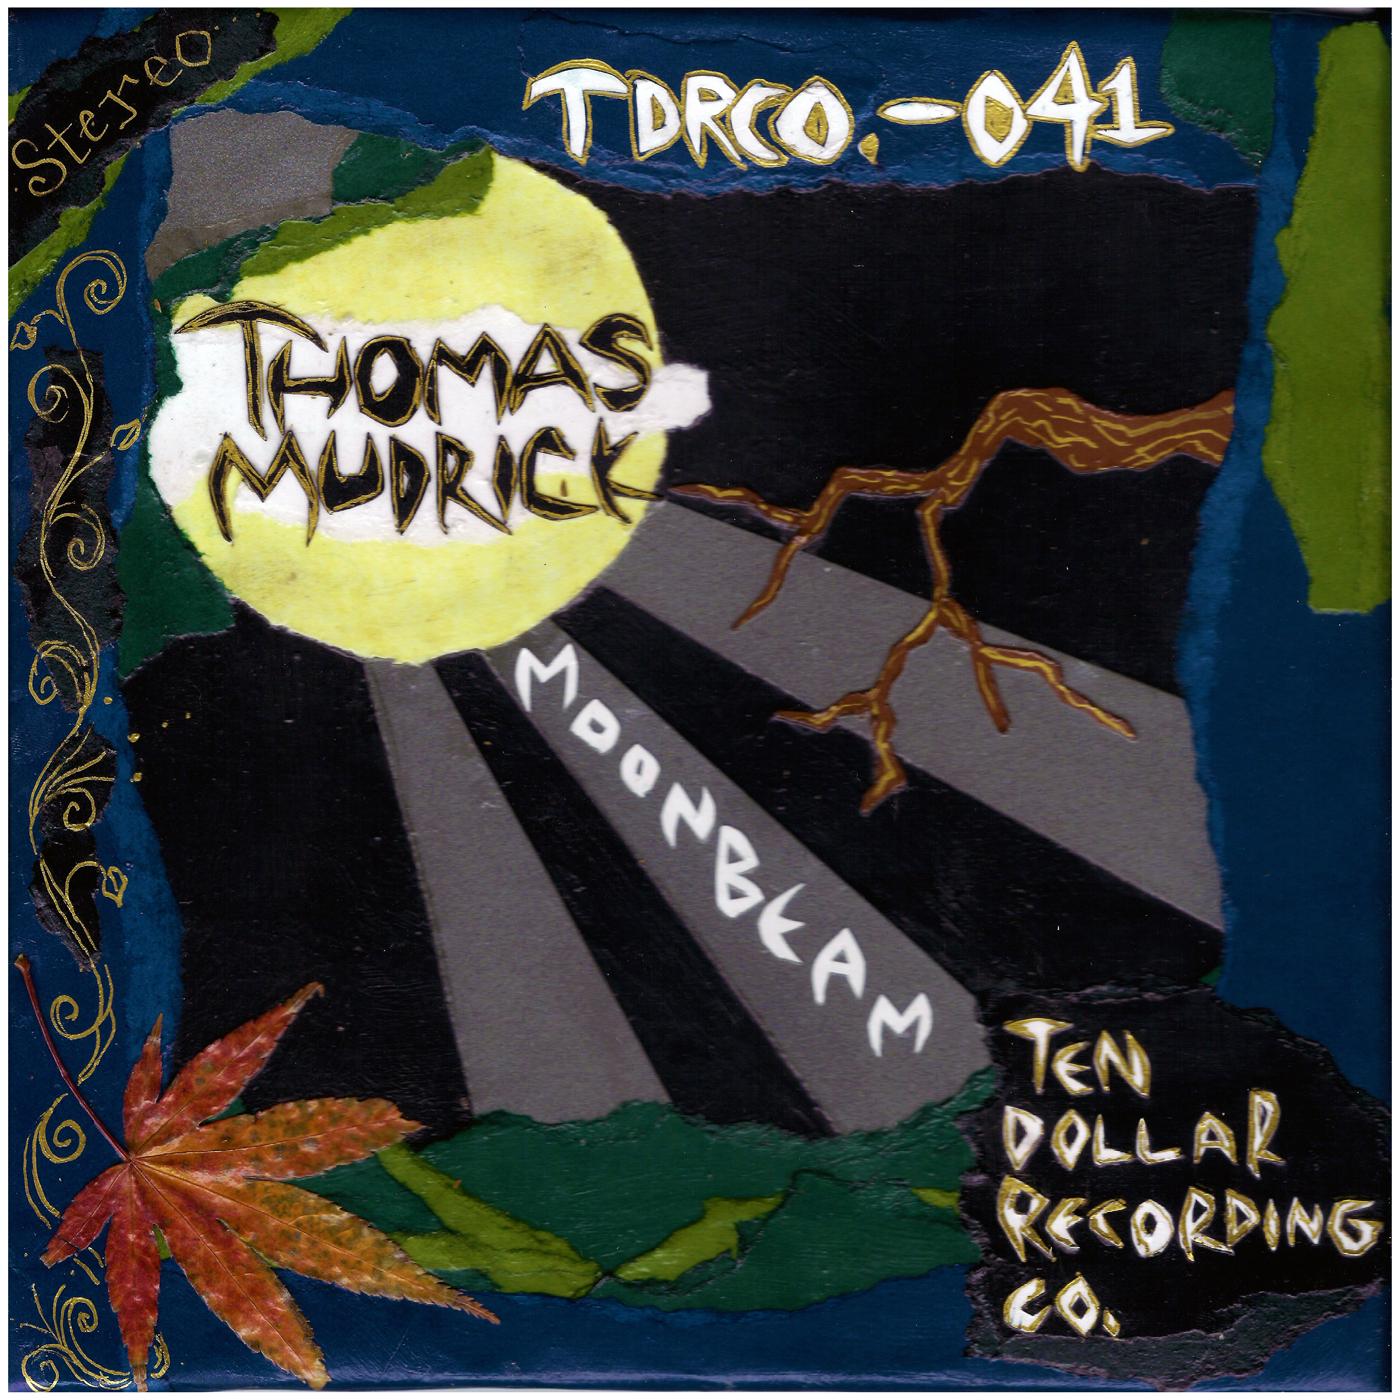 Thomas Mudrick - Moonbeam (Single)